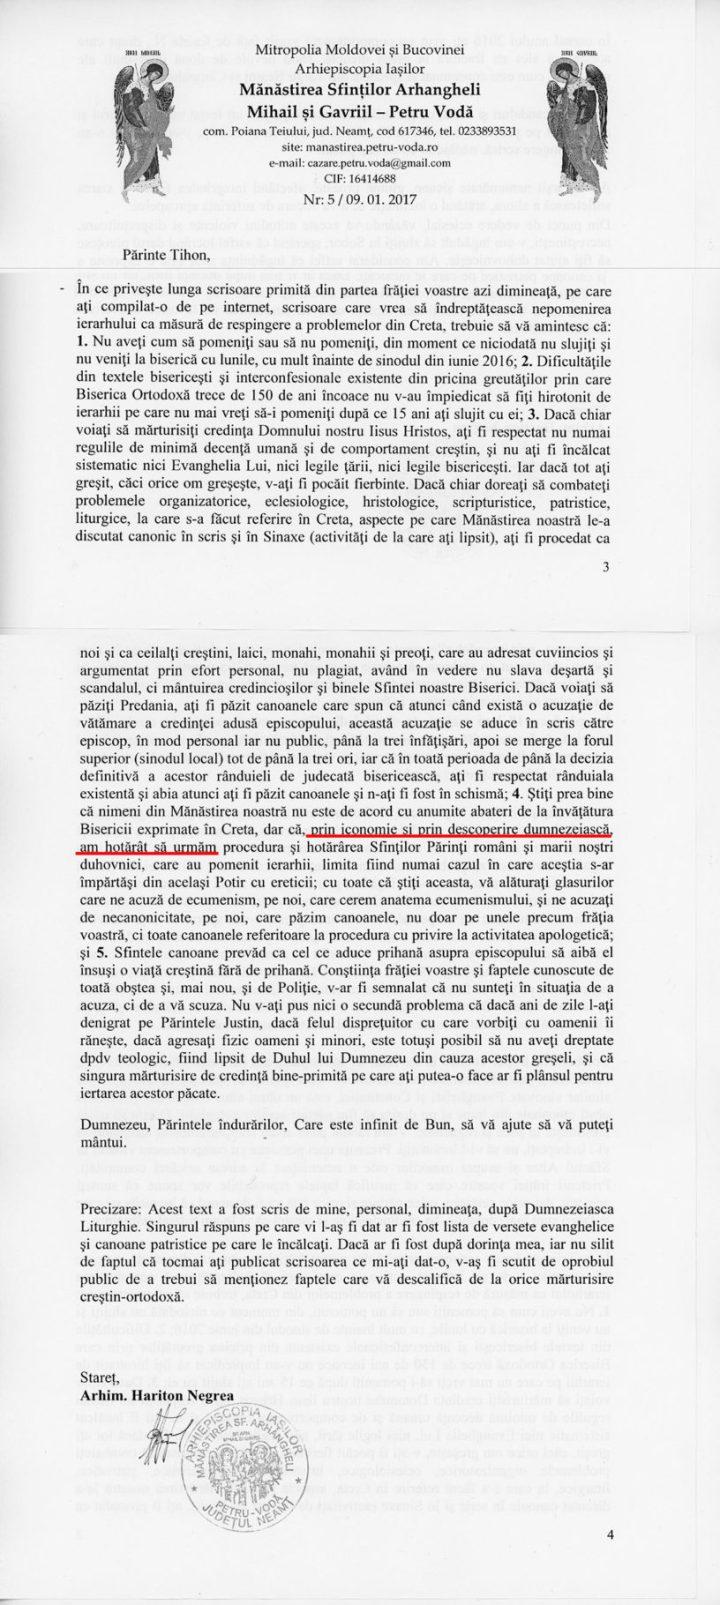 raspuns-catre-p-tihon-816x1820